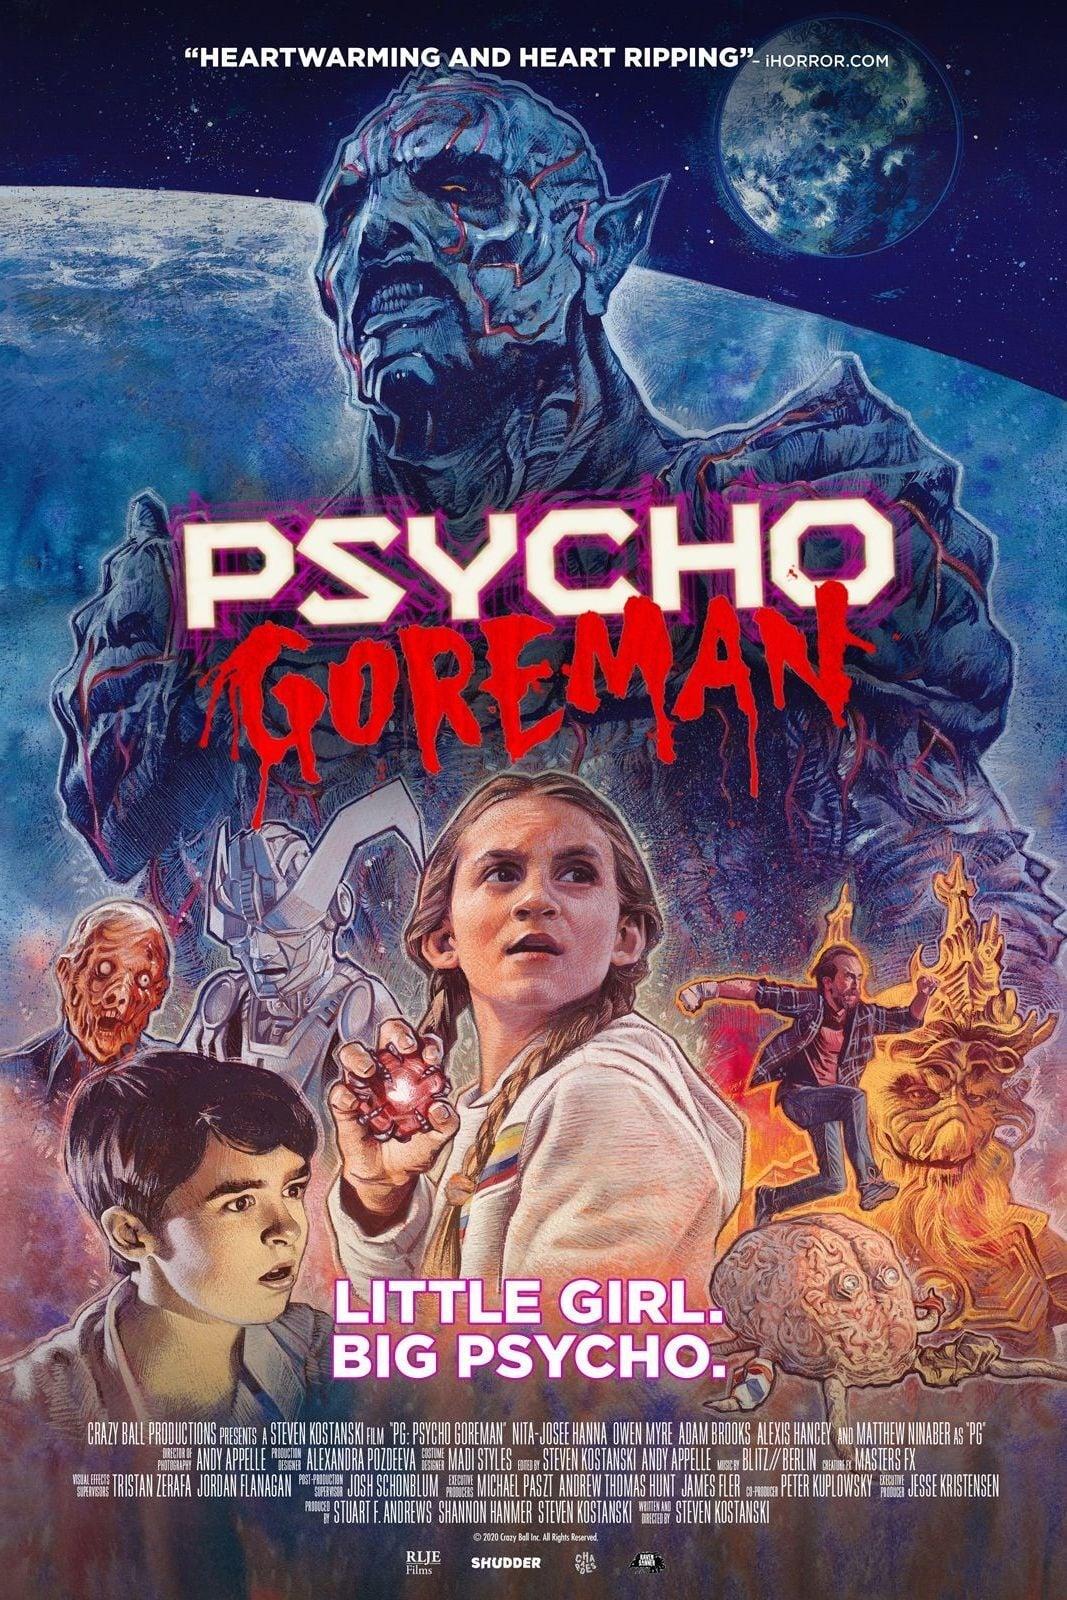 Psycho Goreman poster